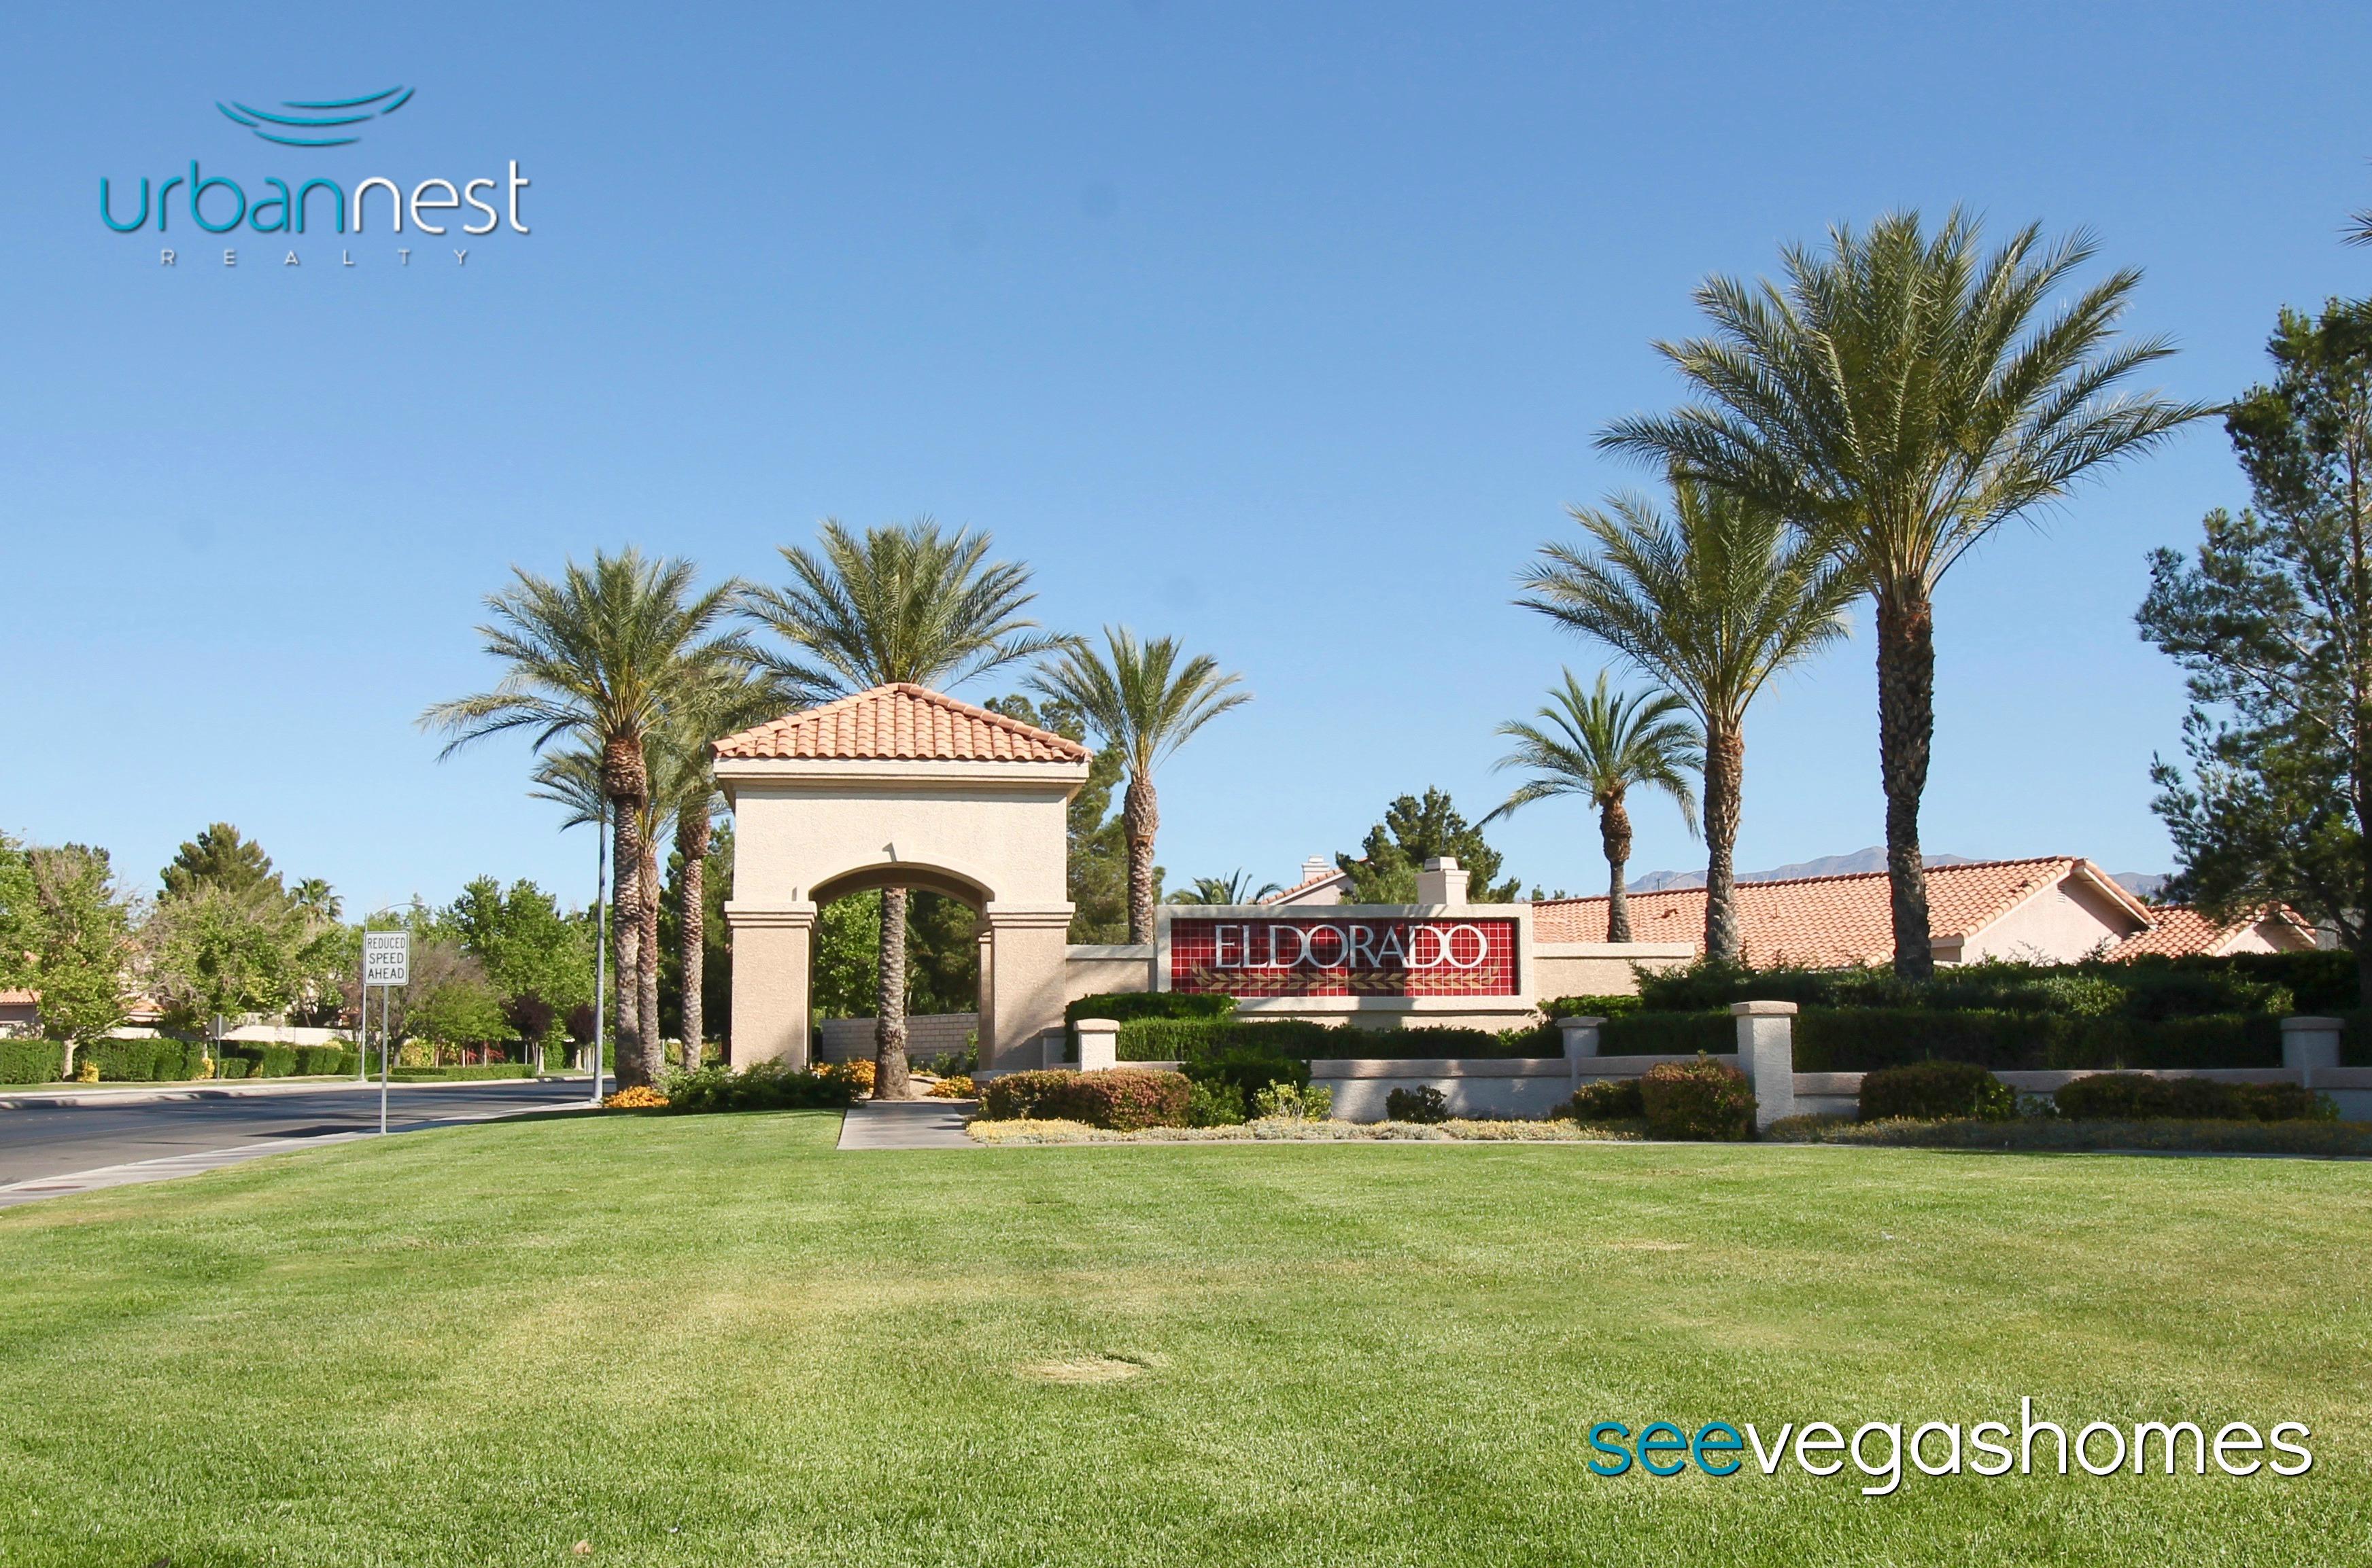 Eldorado North Las Vegas NV 89031 89084 SeeVegasHomes